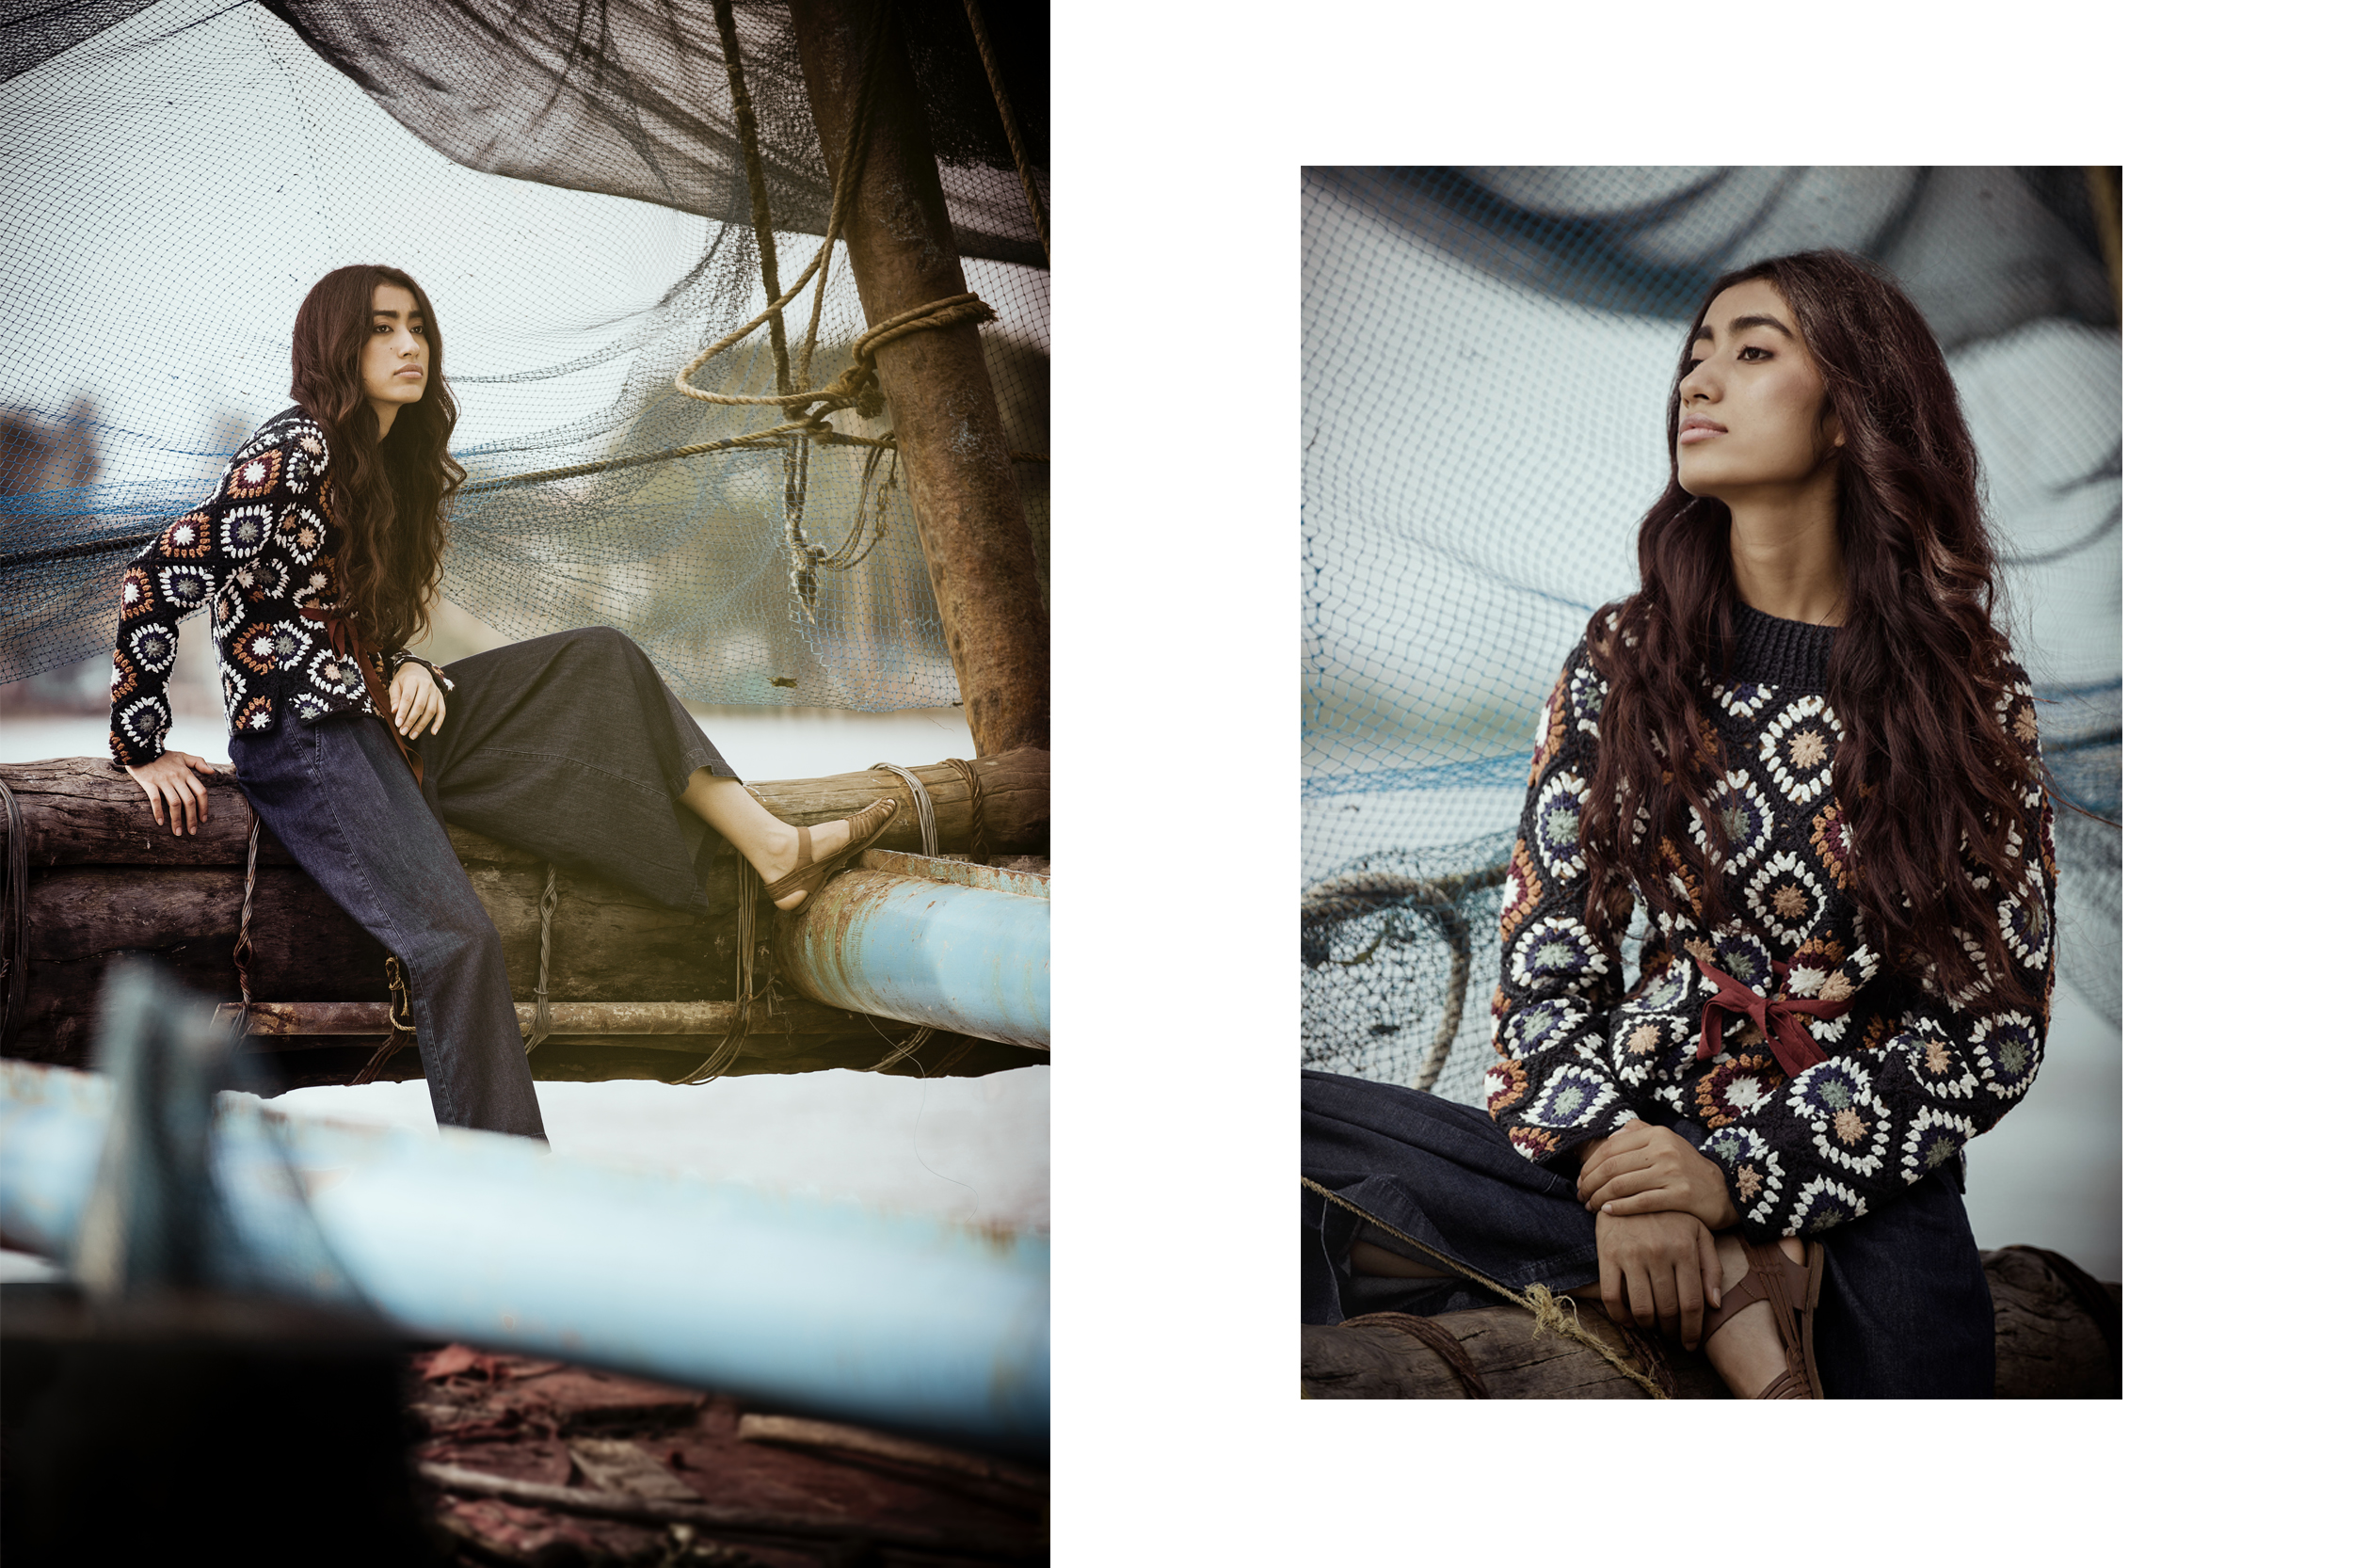 Sindhur_Photography_Fashion_Gloria tep_23.jpg